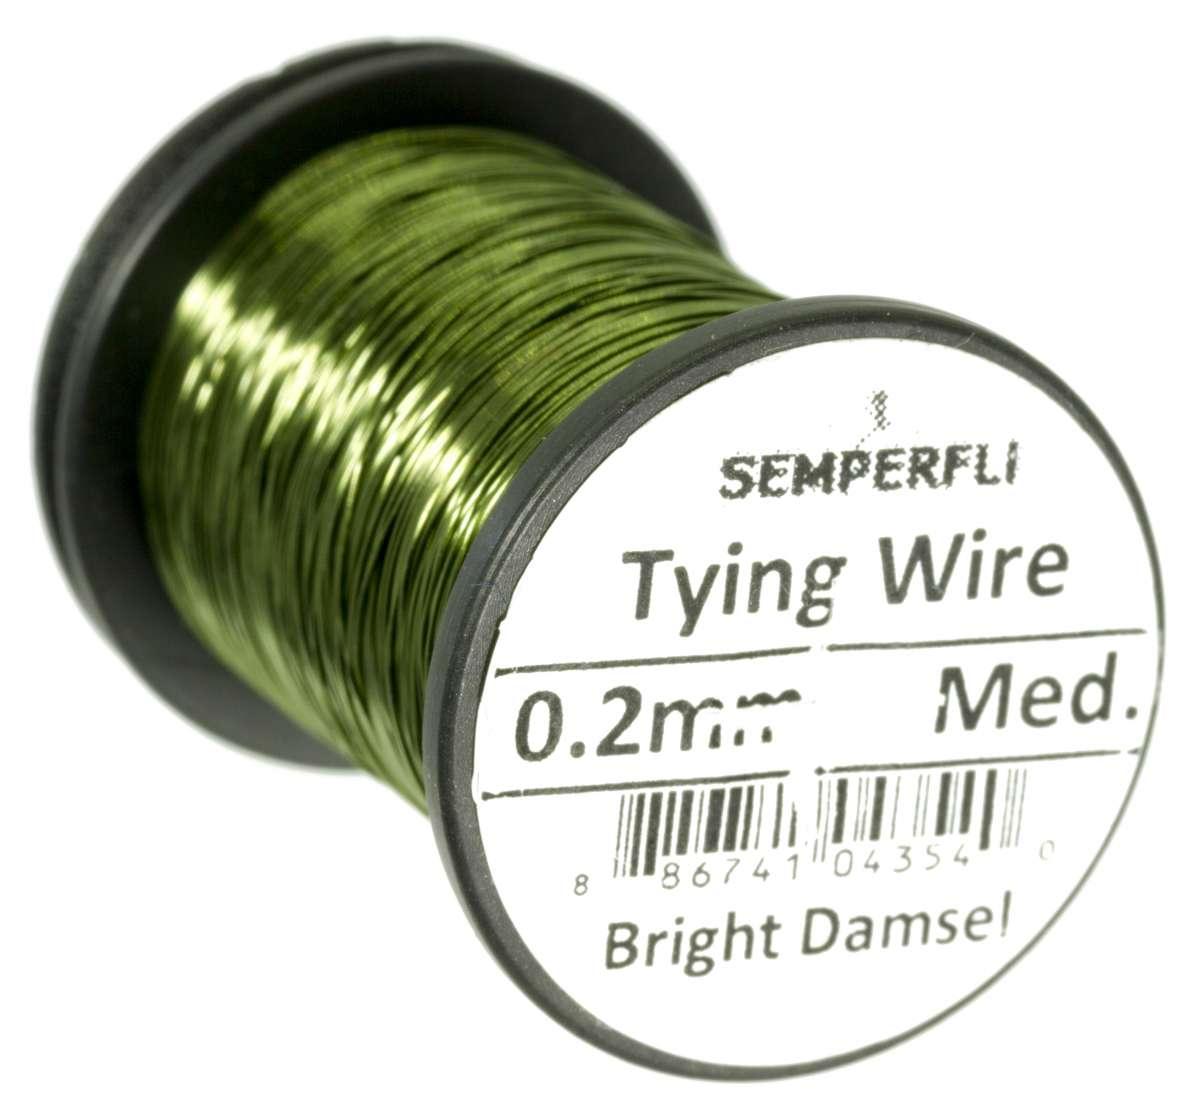 lurewire bright damsel green